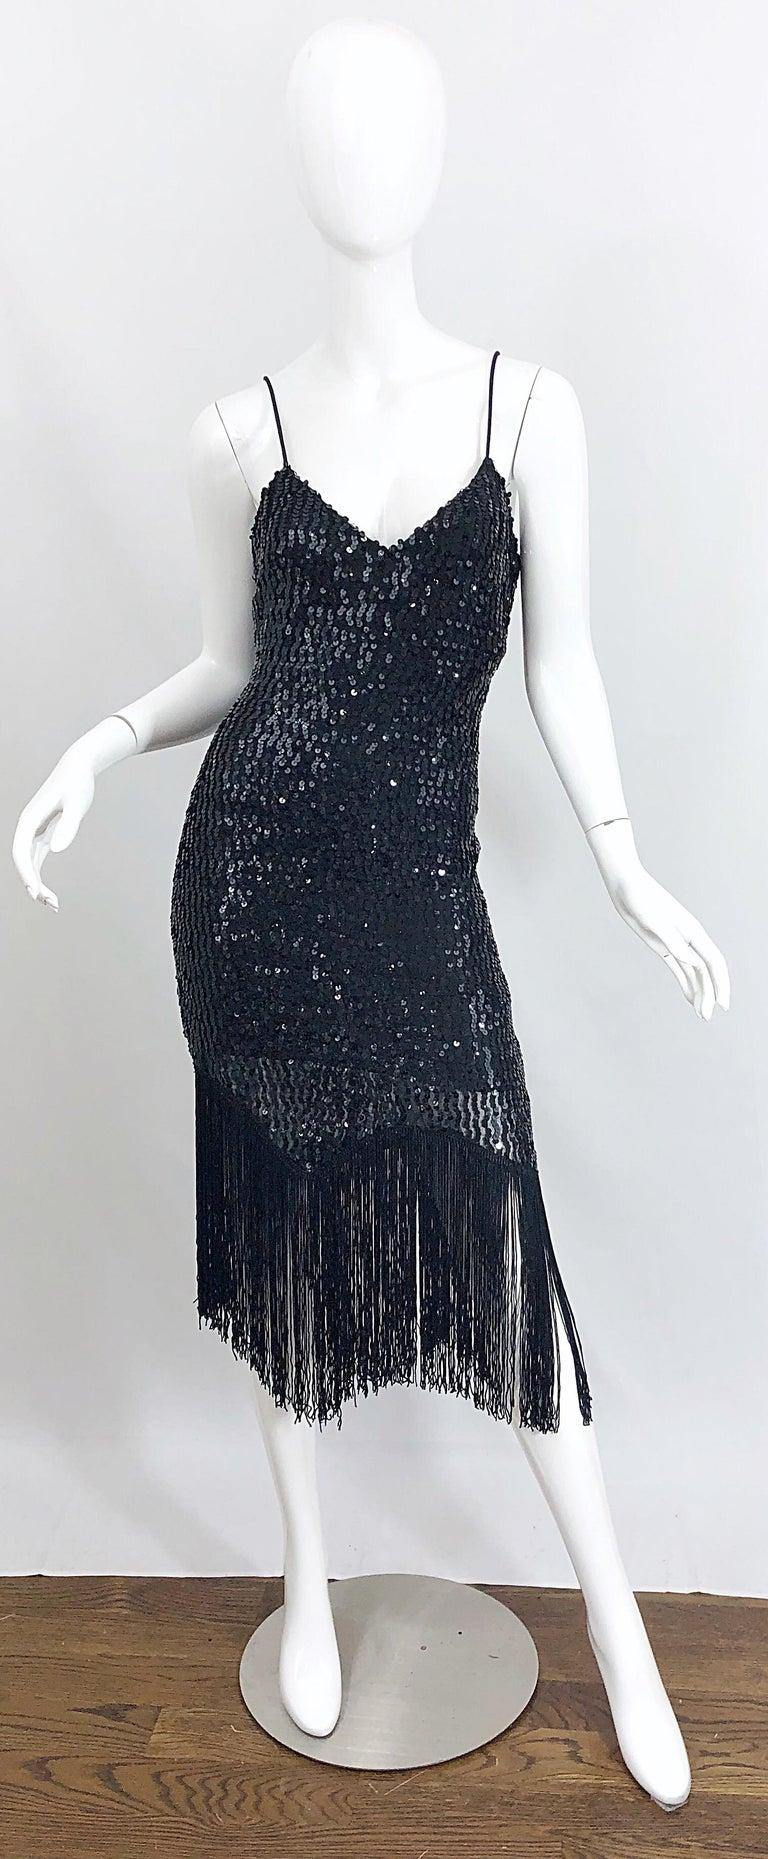 NWT 1970s Joy Stevens Size 10 / 12 Black Sequined Flapper Style Vintage Dress For Sale 10